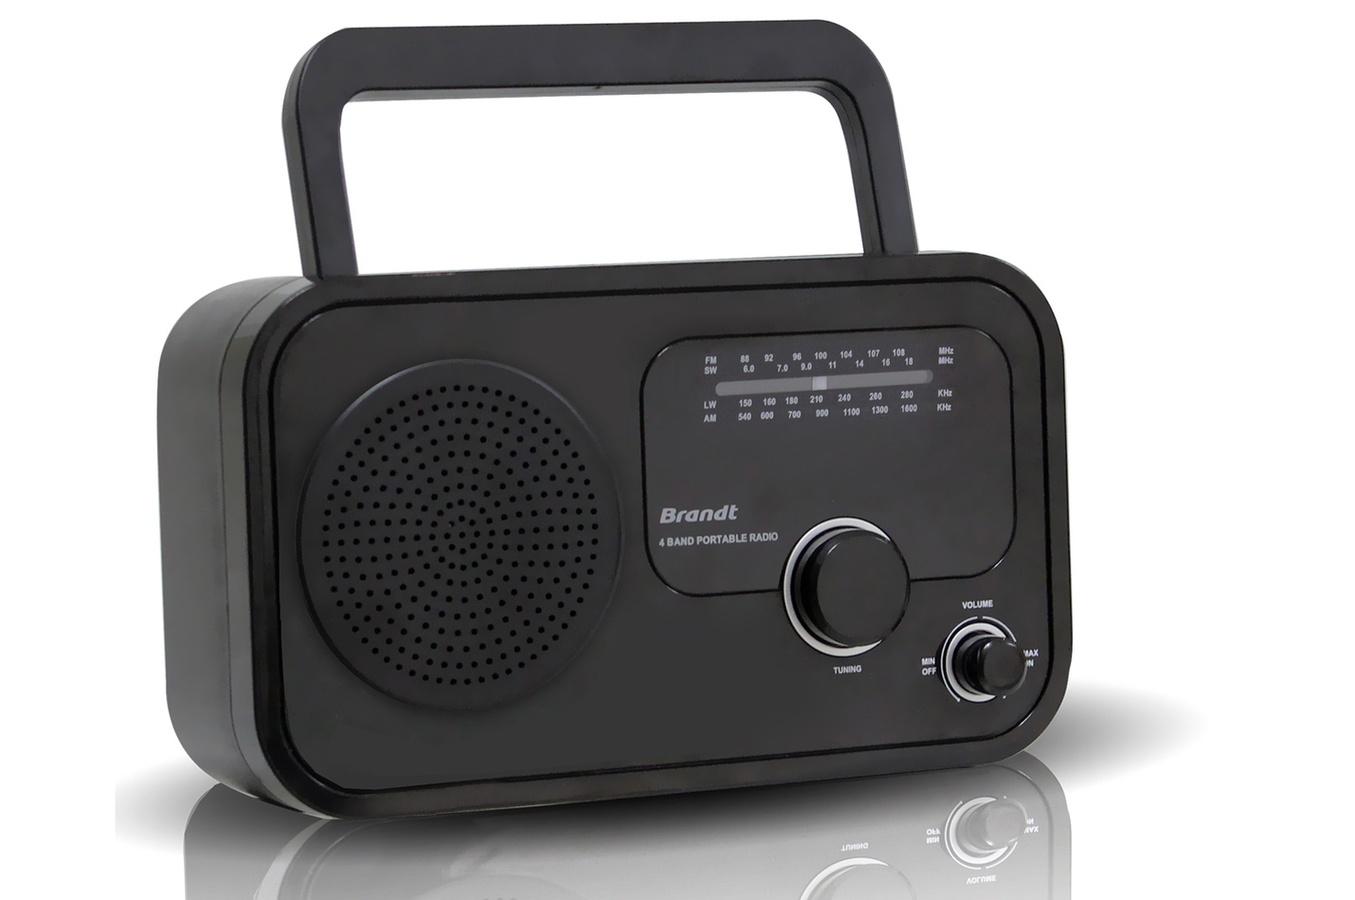 Ecouter sa radio préférée via internet